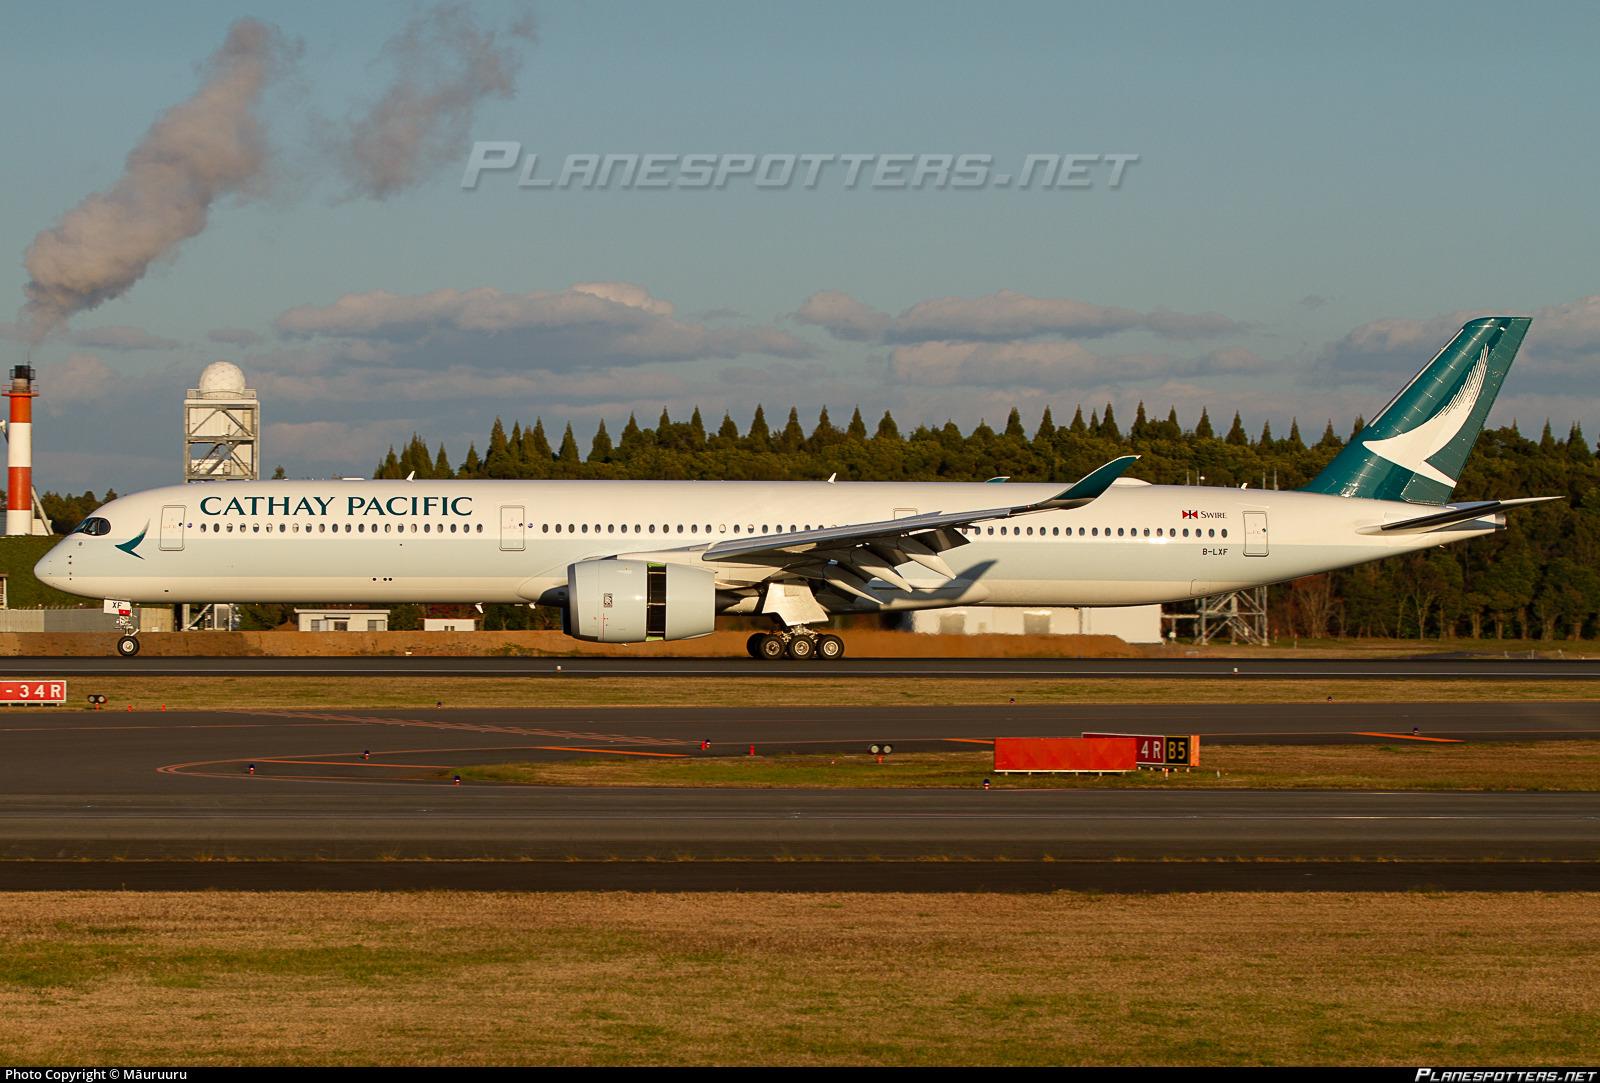 B-LXF Cathay Pacific Airbus A350-1041 Photo by TAHITI_IAORANA | ID 908113 | Planespotters.net